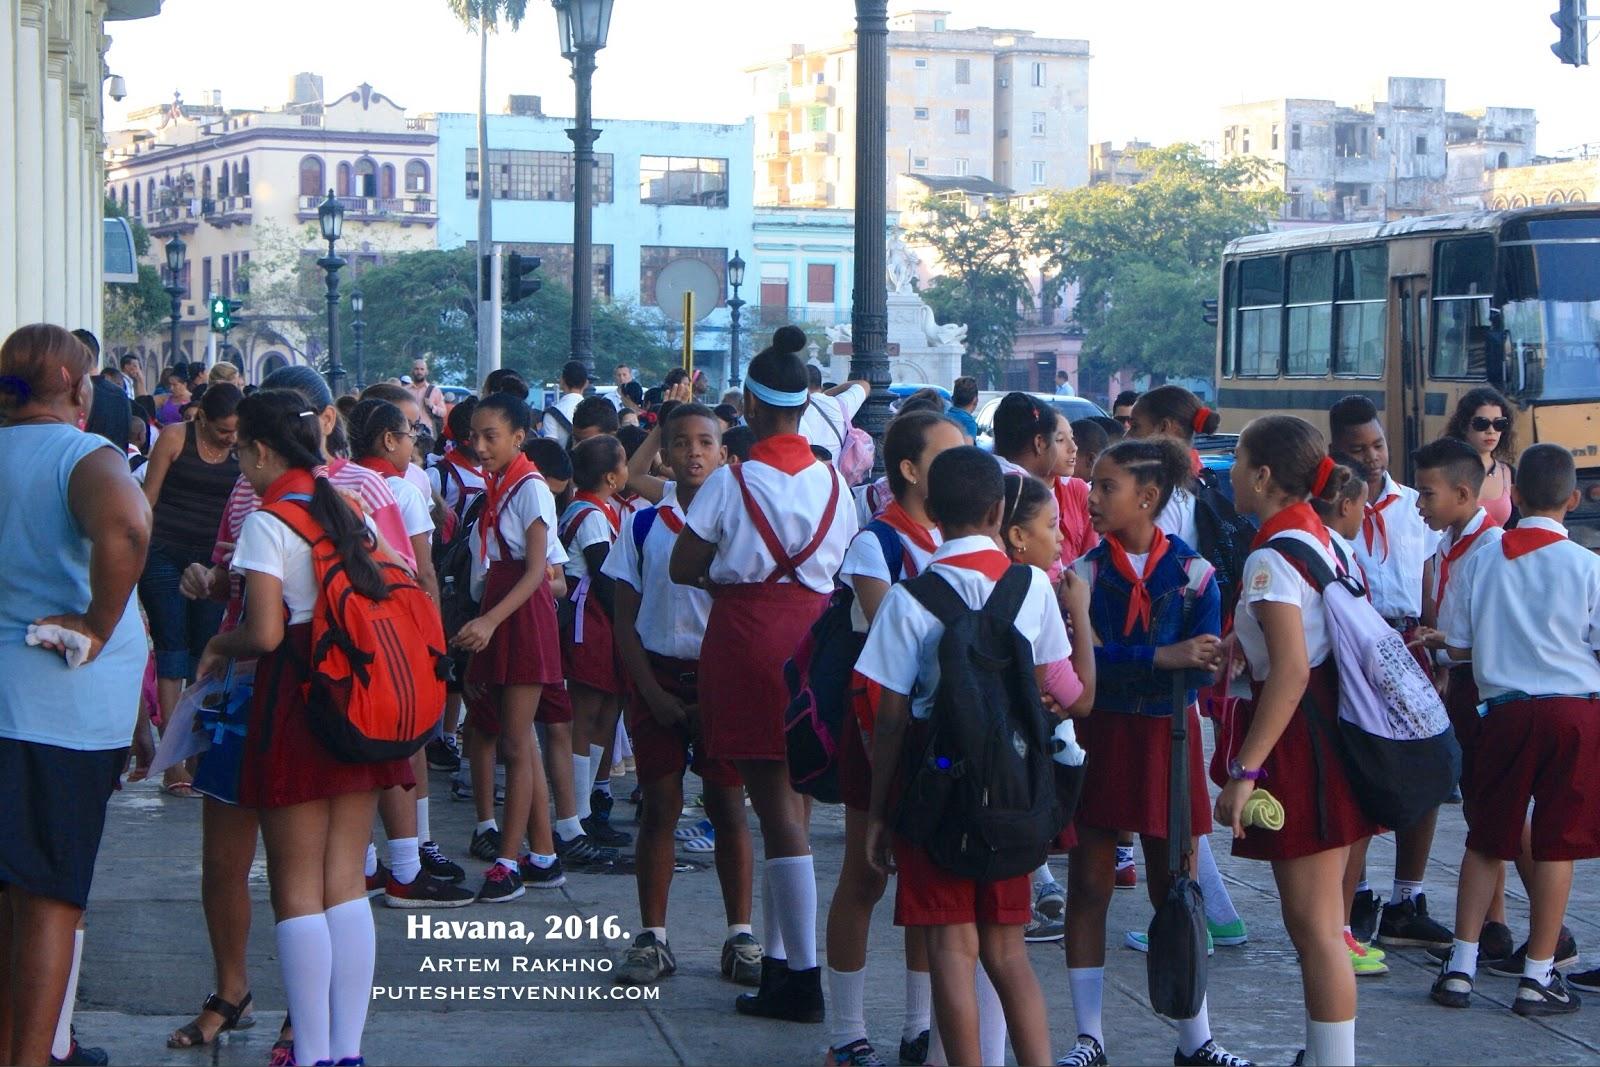 Пионеры Кубы